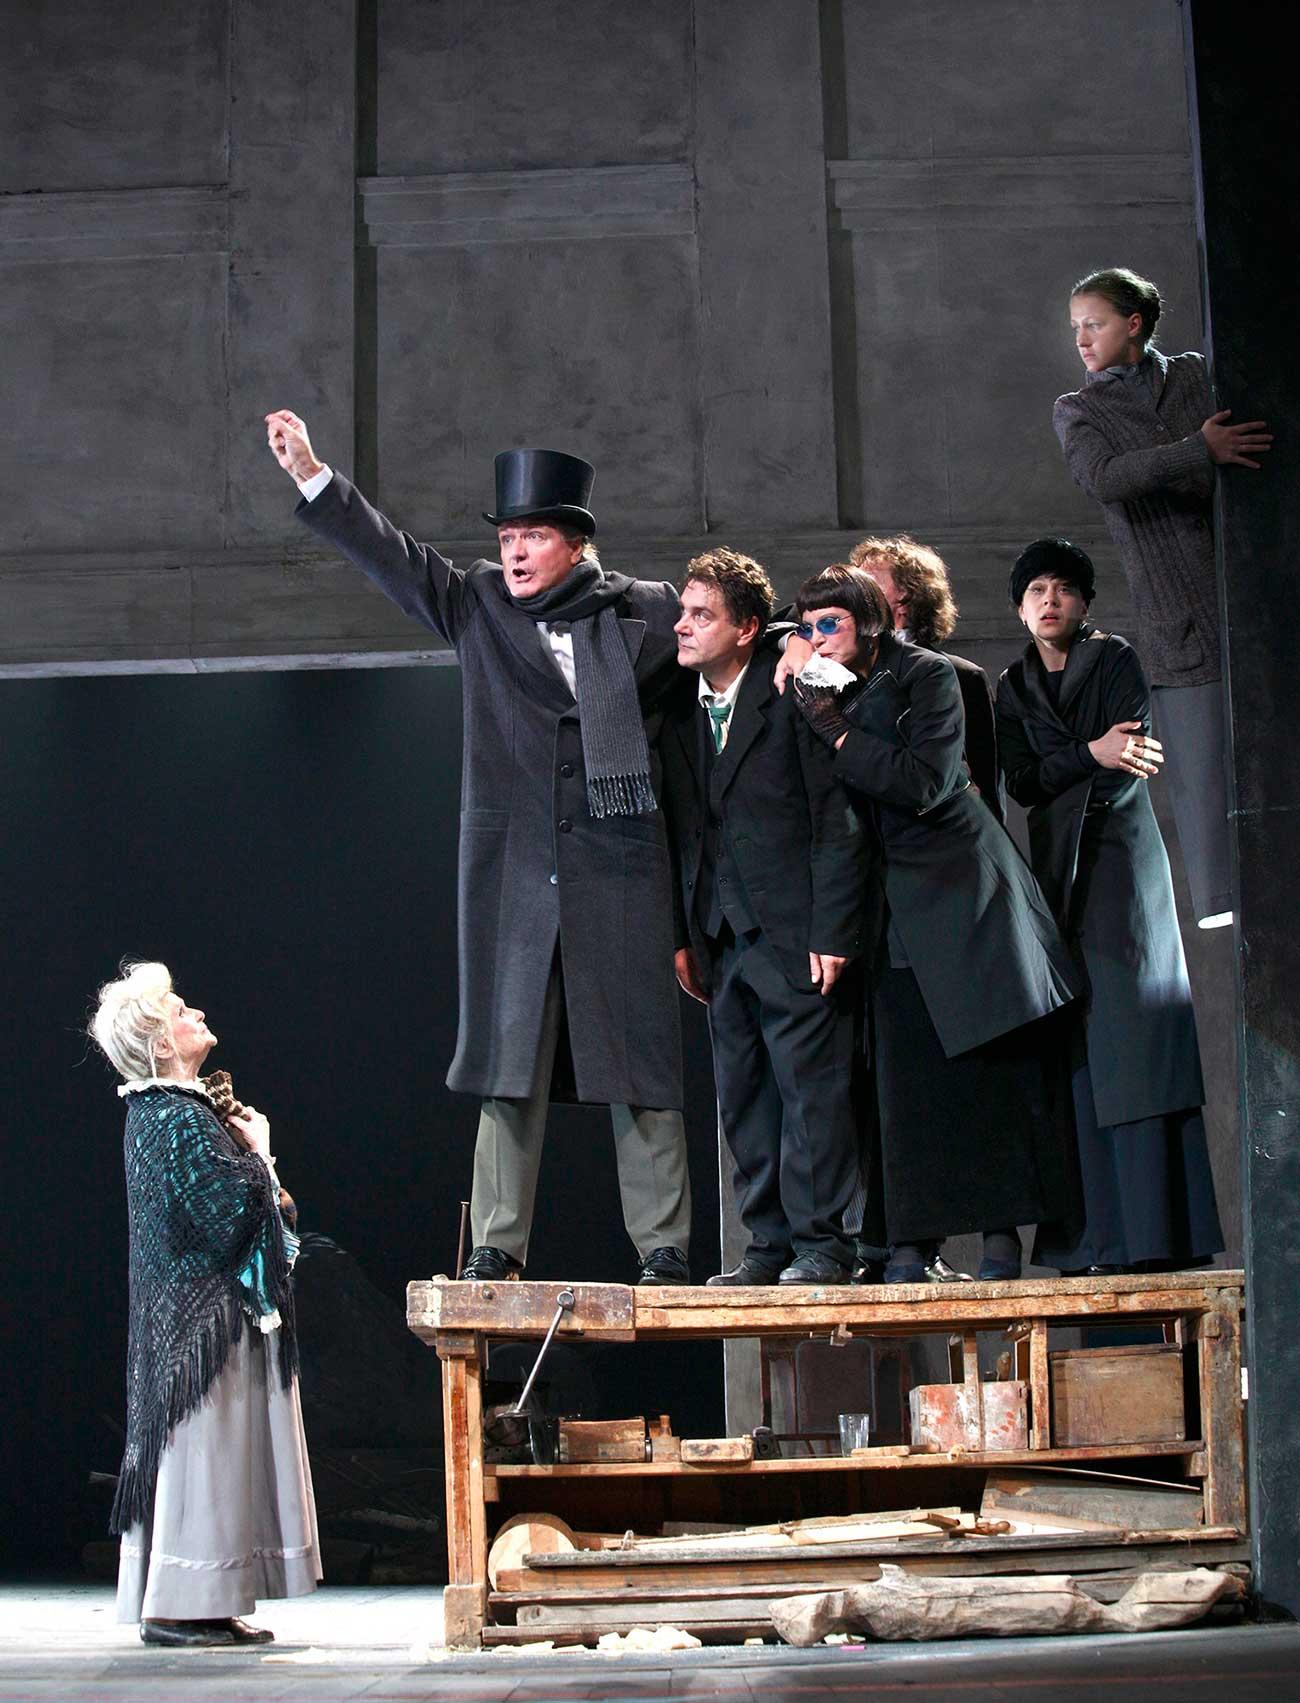 'Uncle Vanya' by the Vakhtangov Theater / Press photo